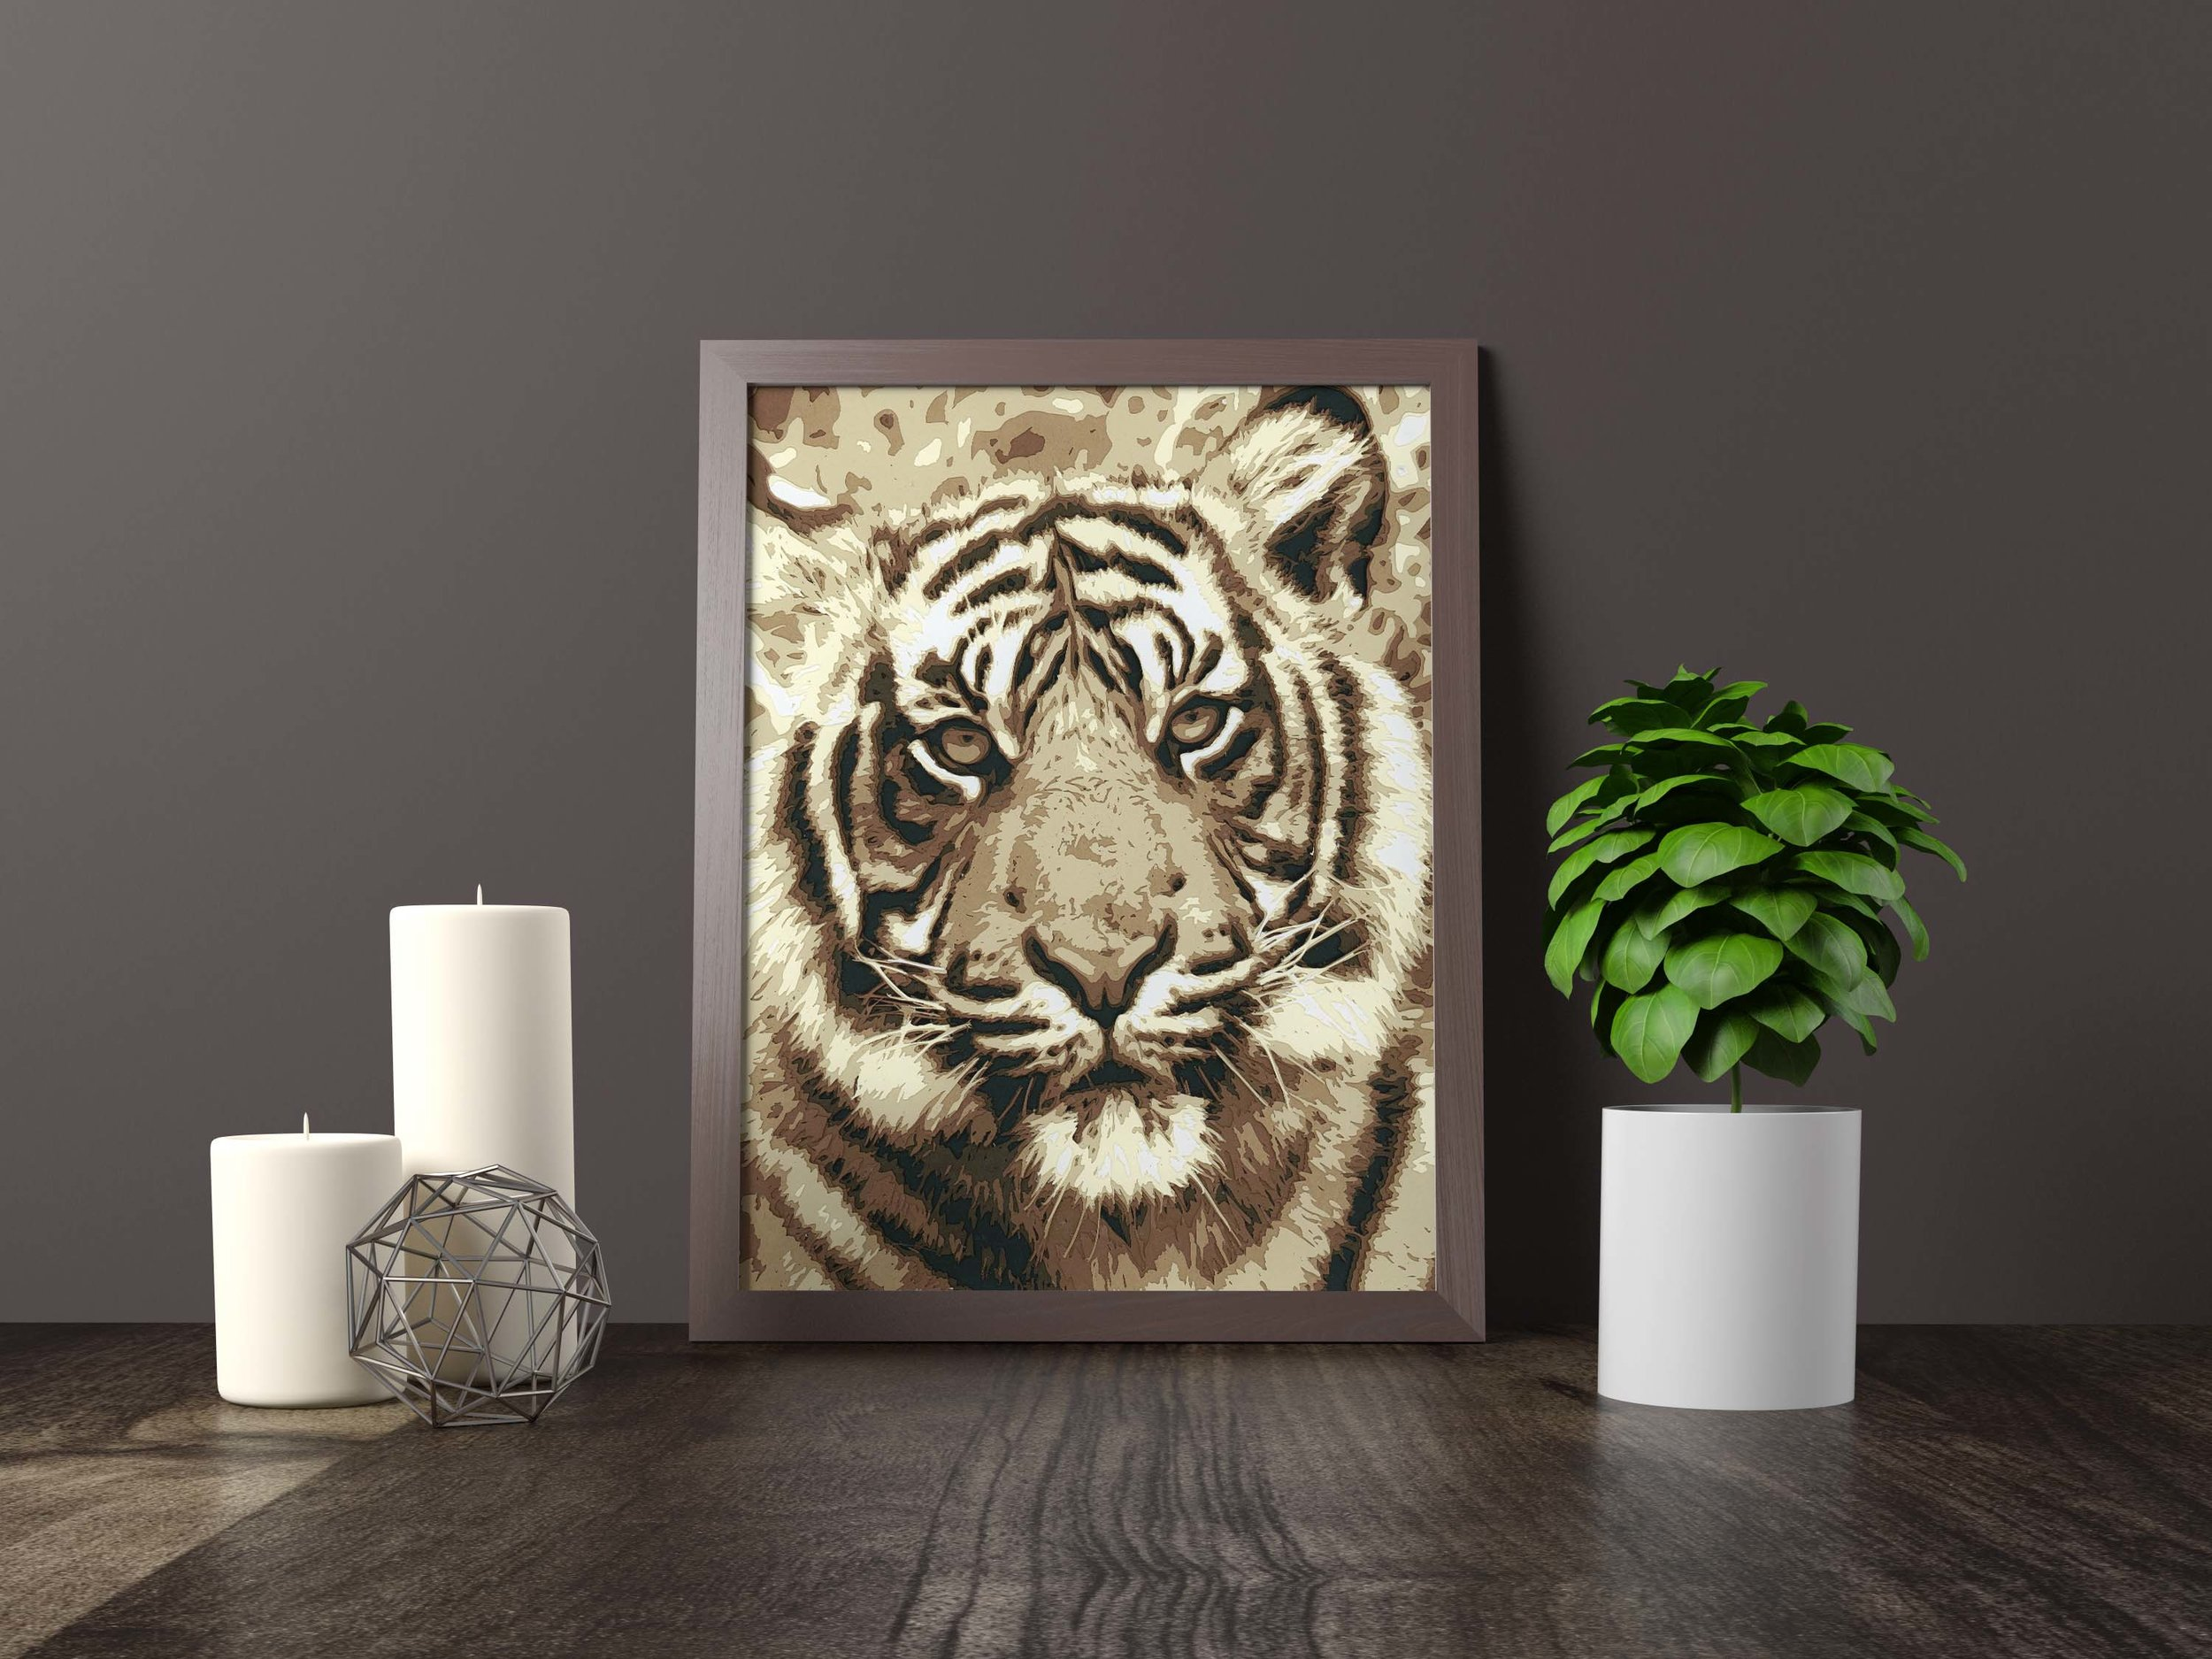 tiger 2 - Original *SOLD*11